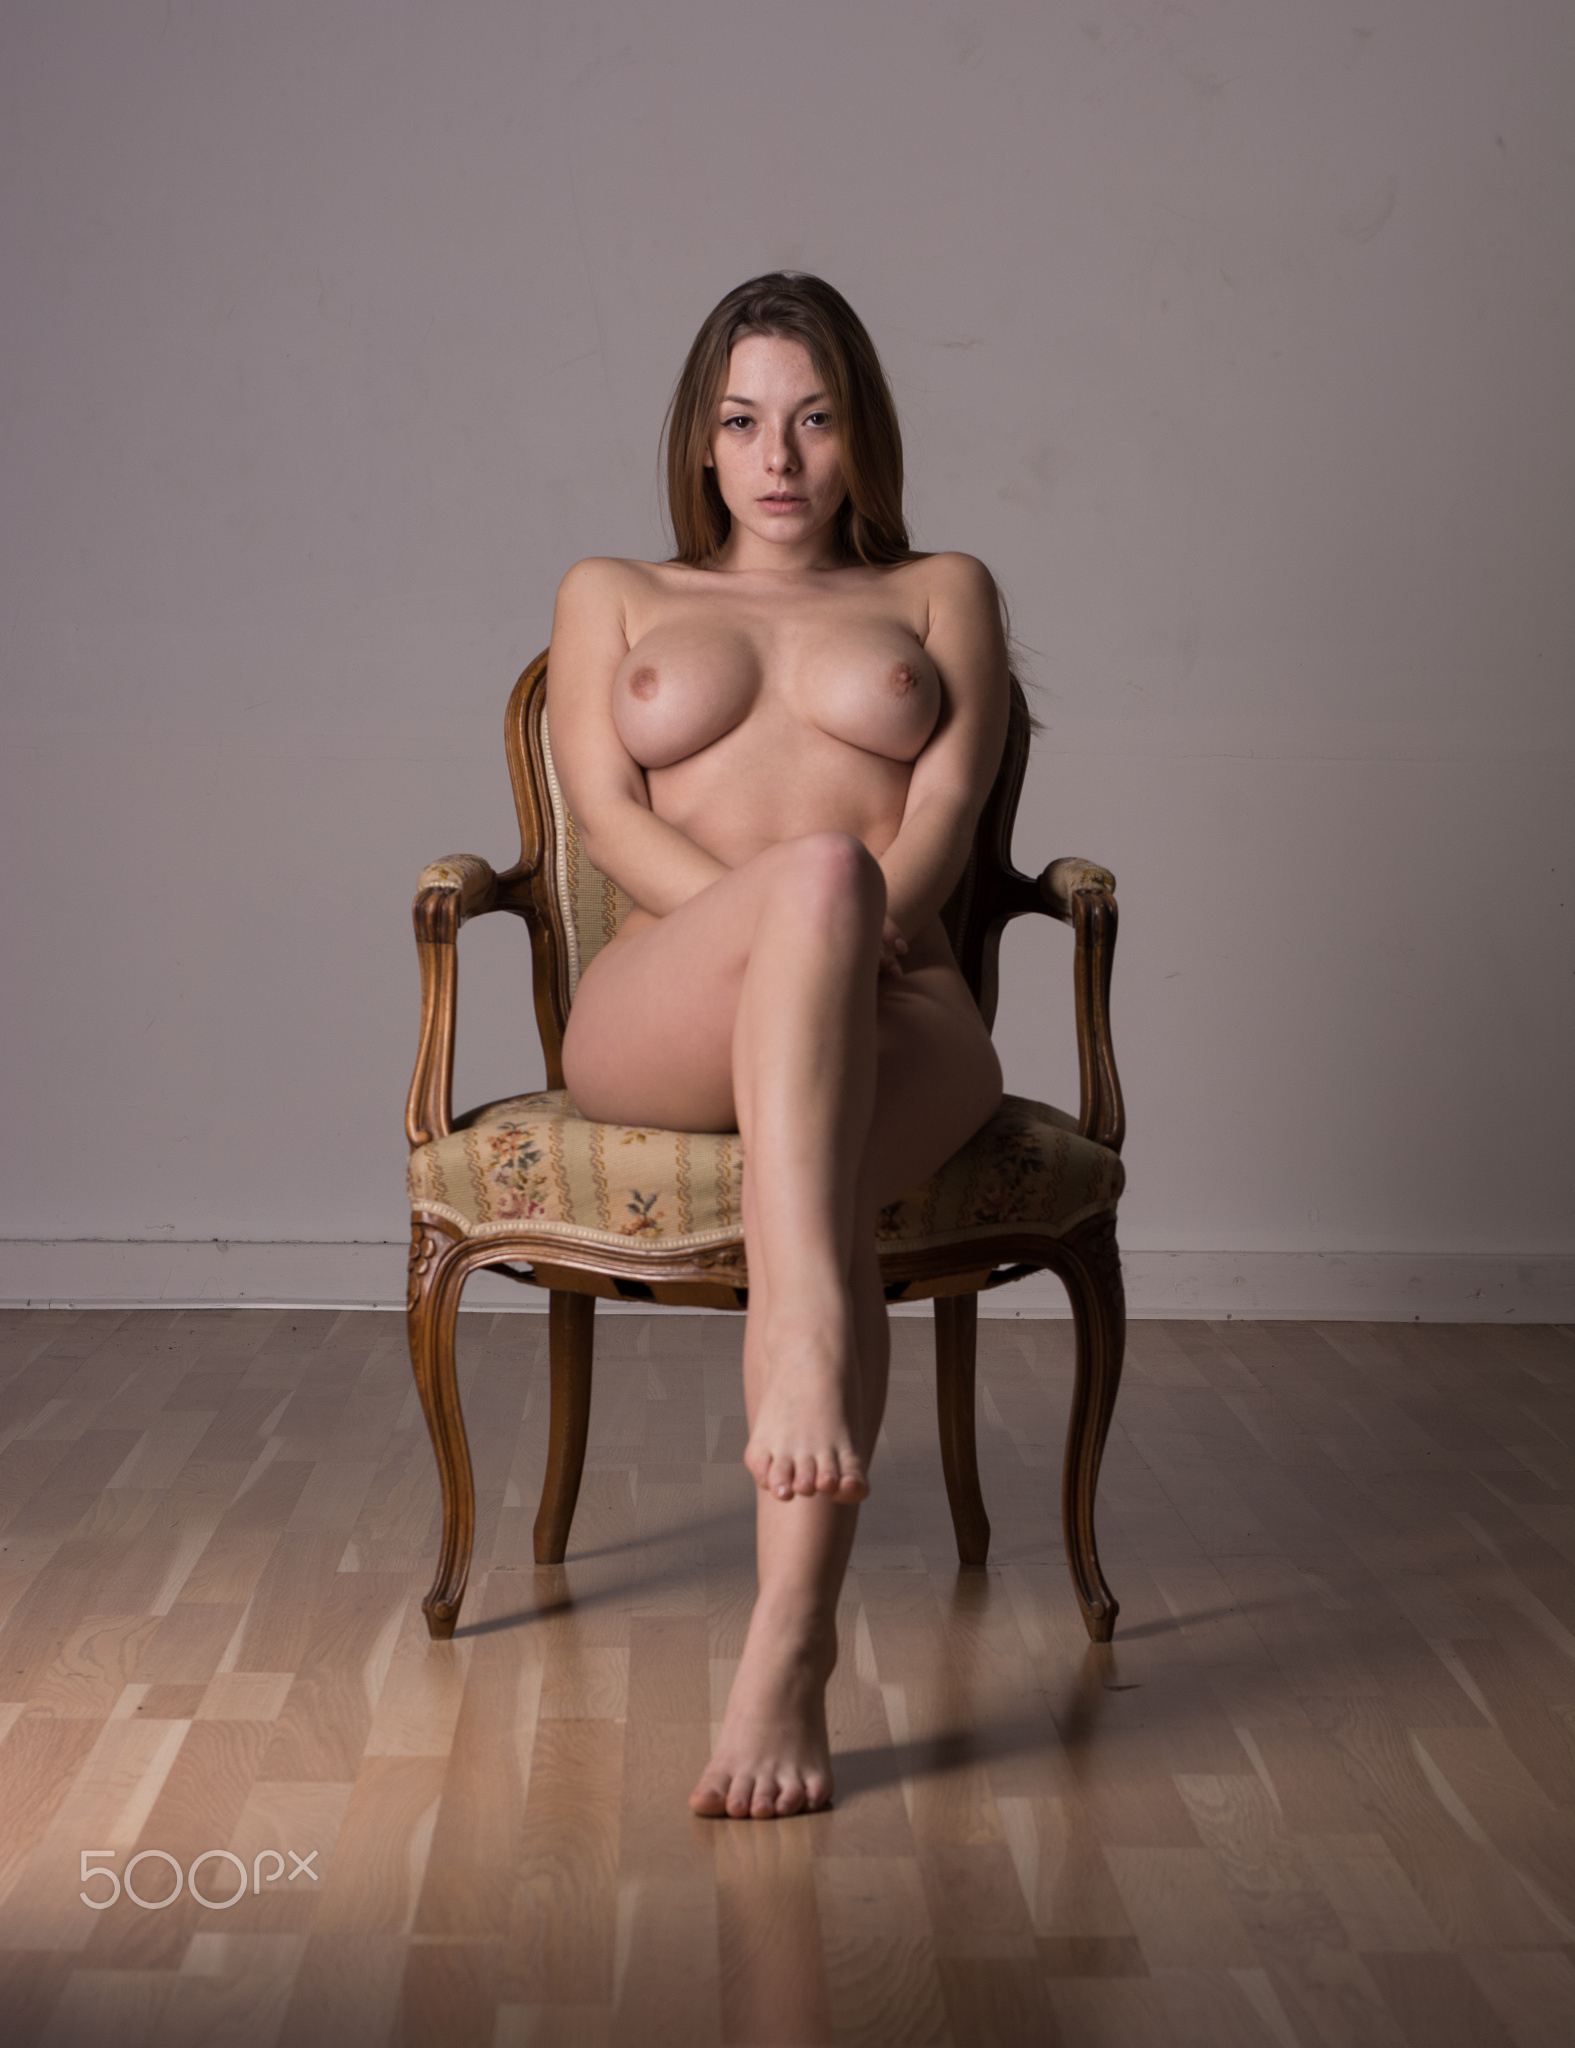 Olga Kobzar Nude Pictures. Rating = 8.98/10